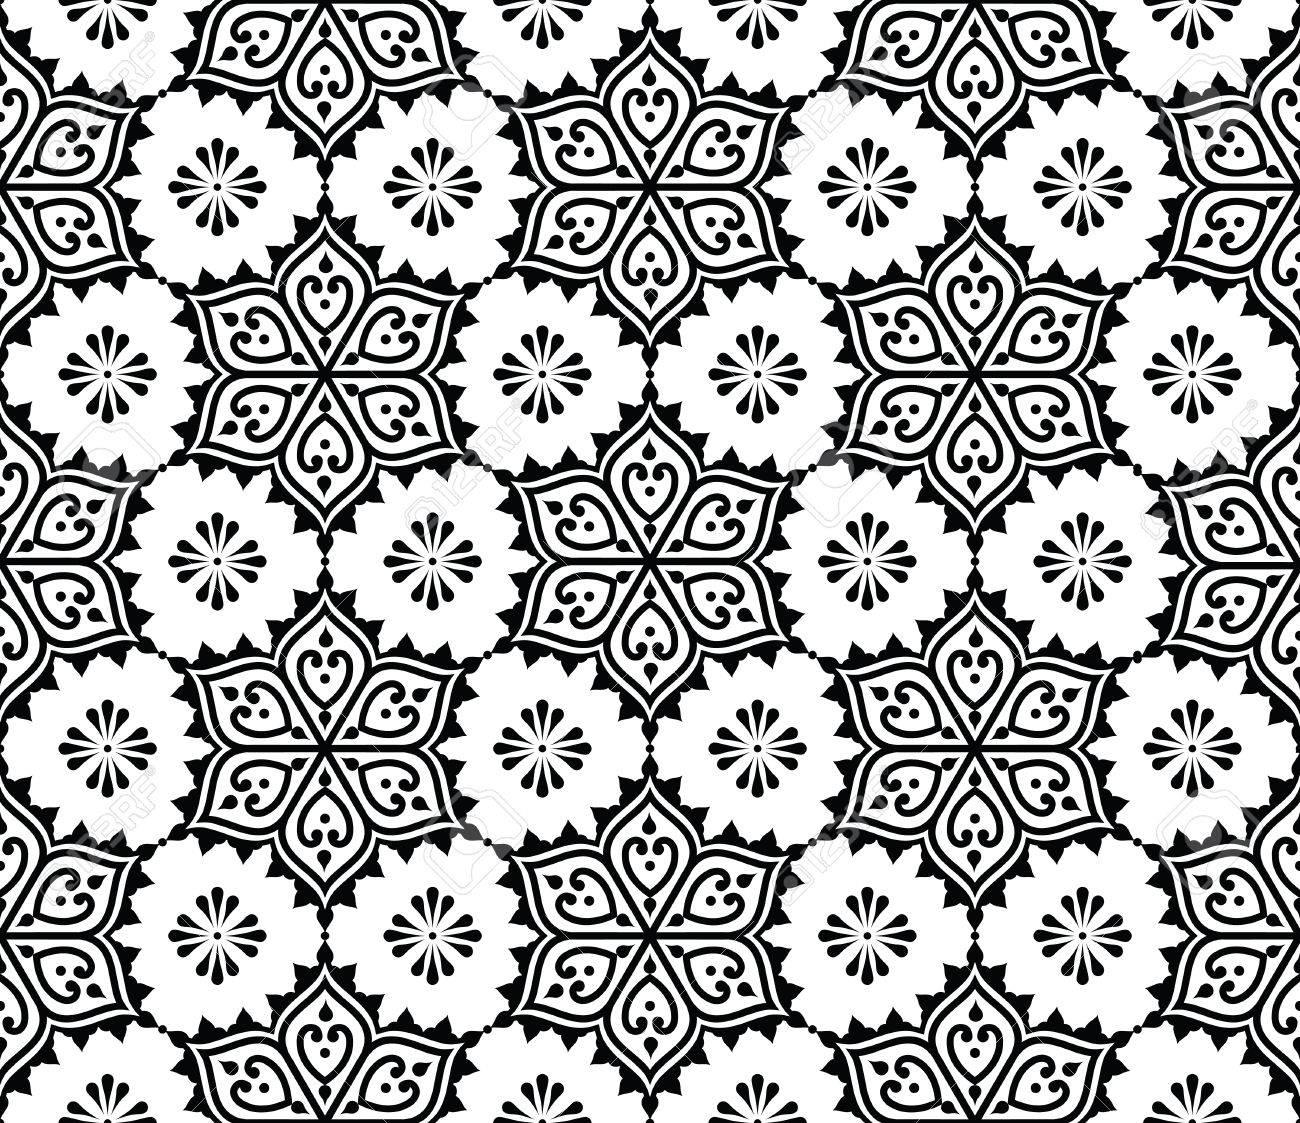 Indian Seamless Pattern Repetitive Mehndi Design Royalty Free